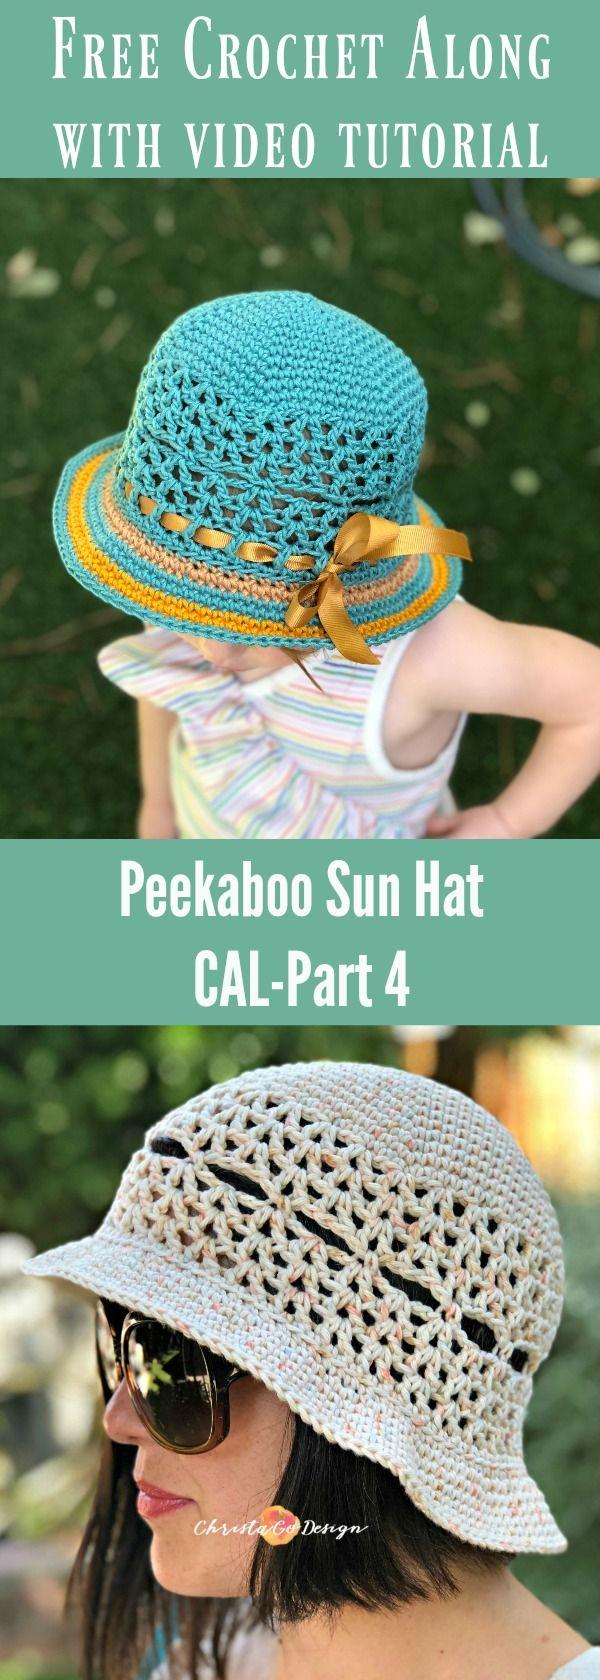 Peekaboo Sun Hat Free Crochet Along Part 4 Brim Christacodesign